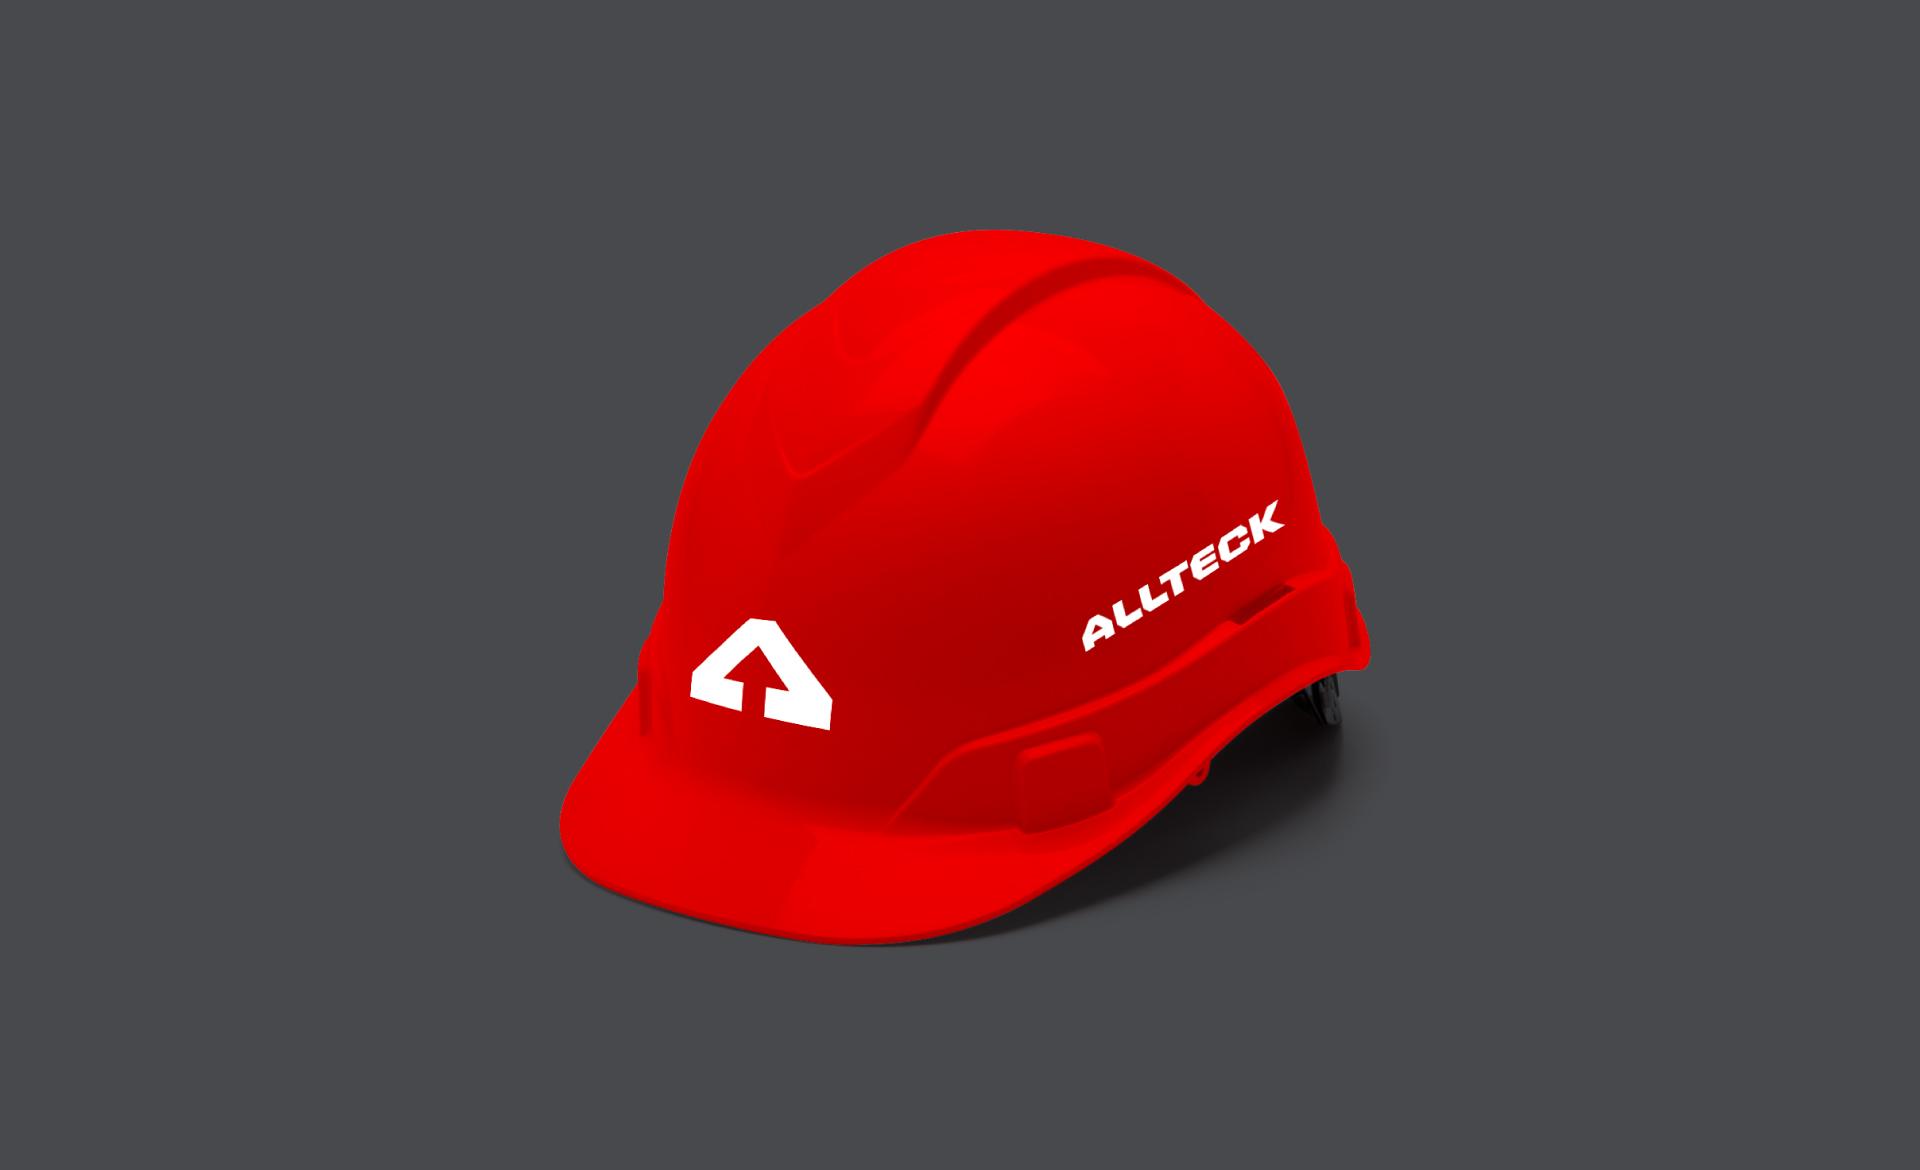 Allteck_10